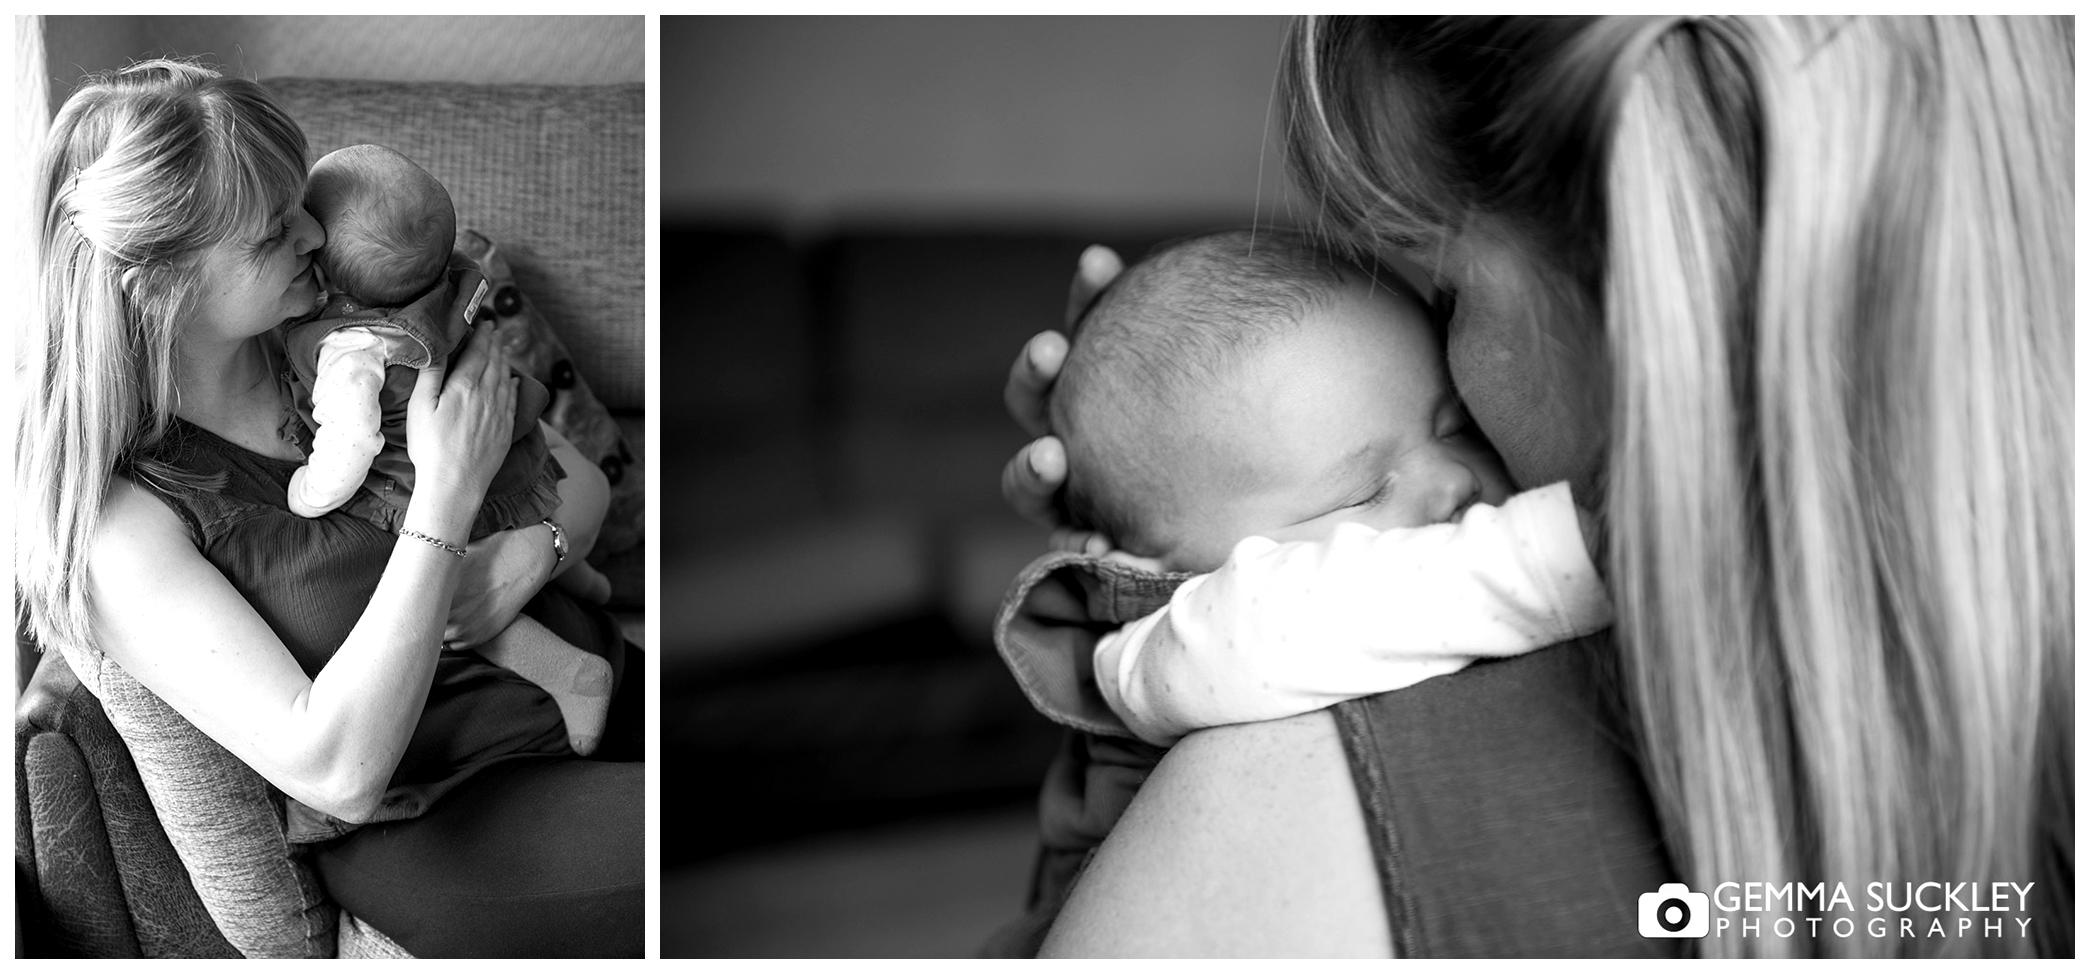 a mum cuddling her newborn baby